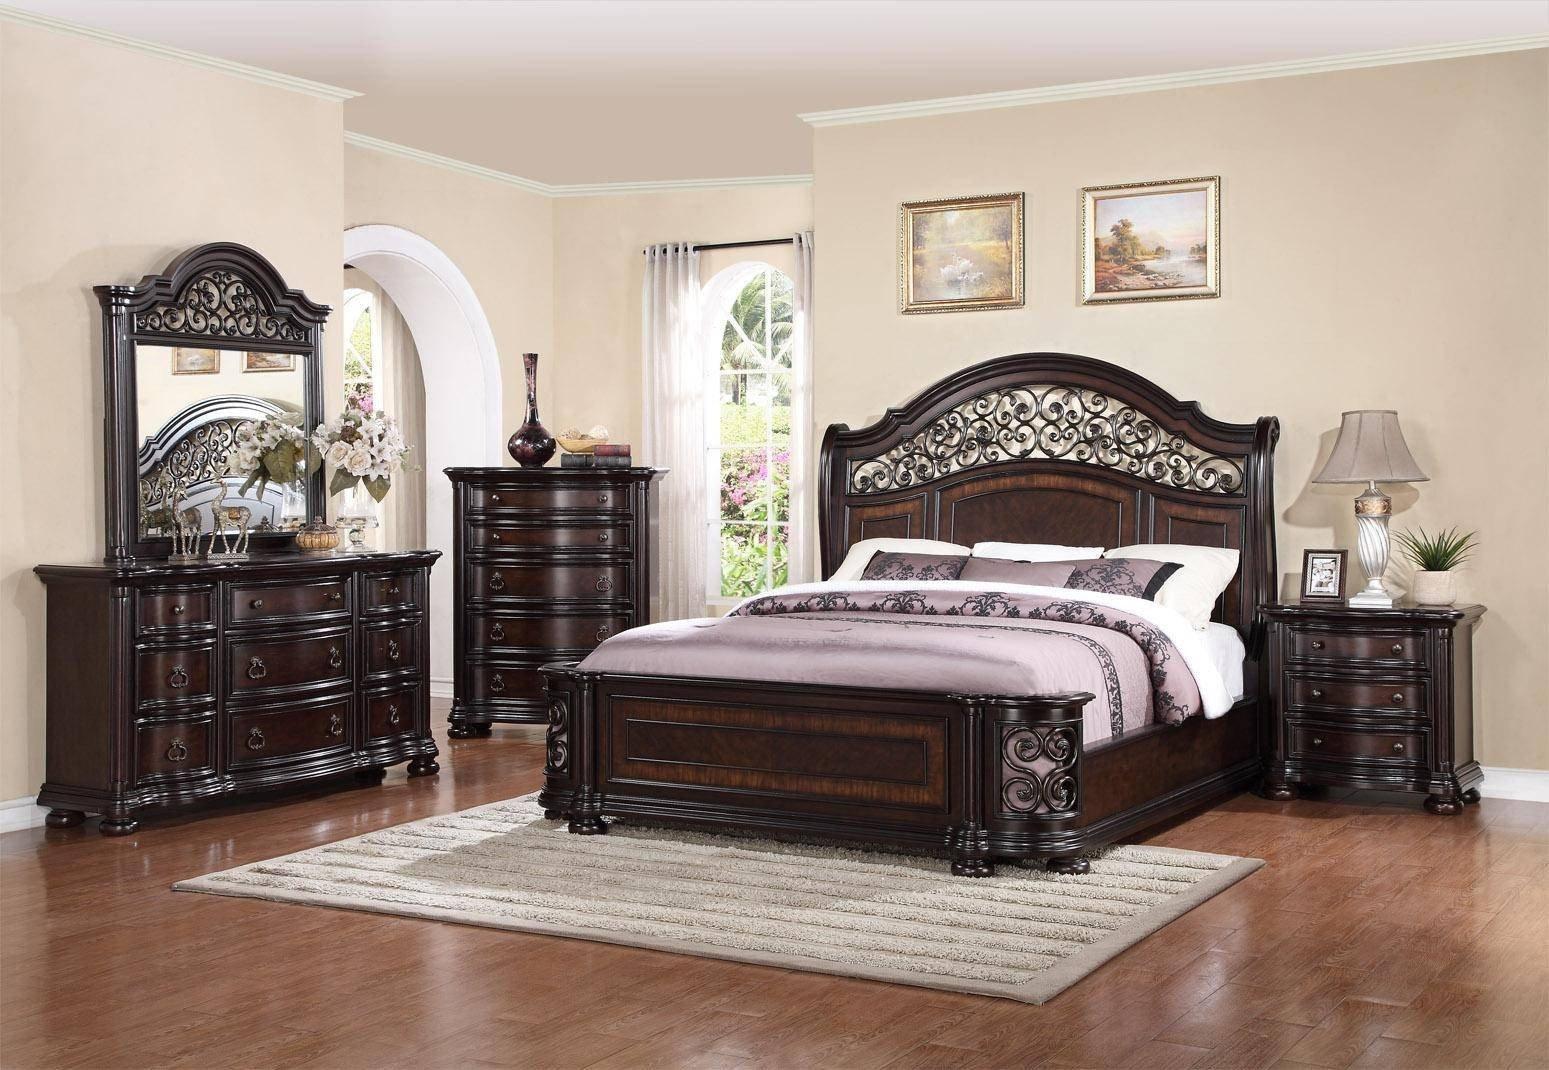 Full Bedroom Furniture Set Fresh Mcferran B366 Allison Espresso Finish solid Hardwood